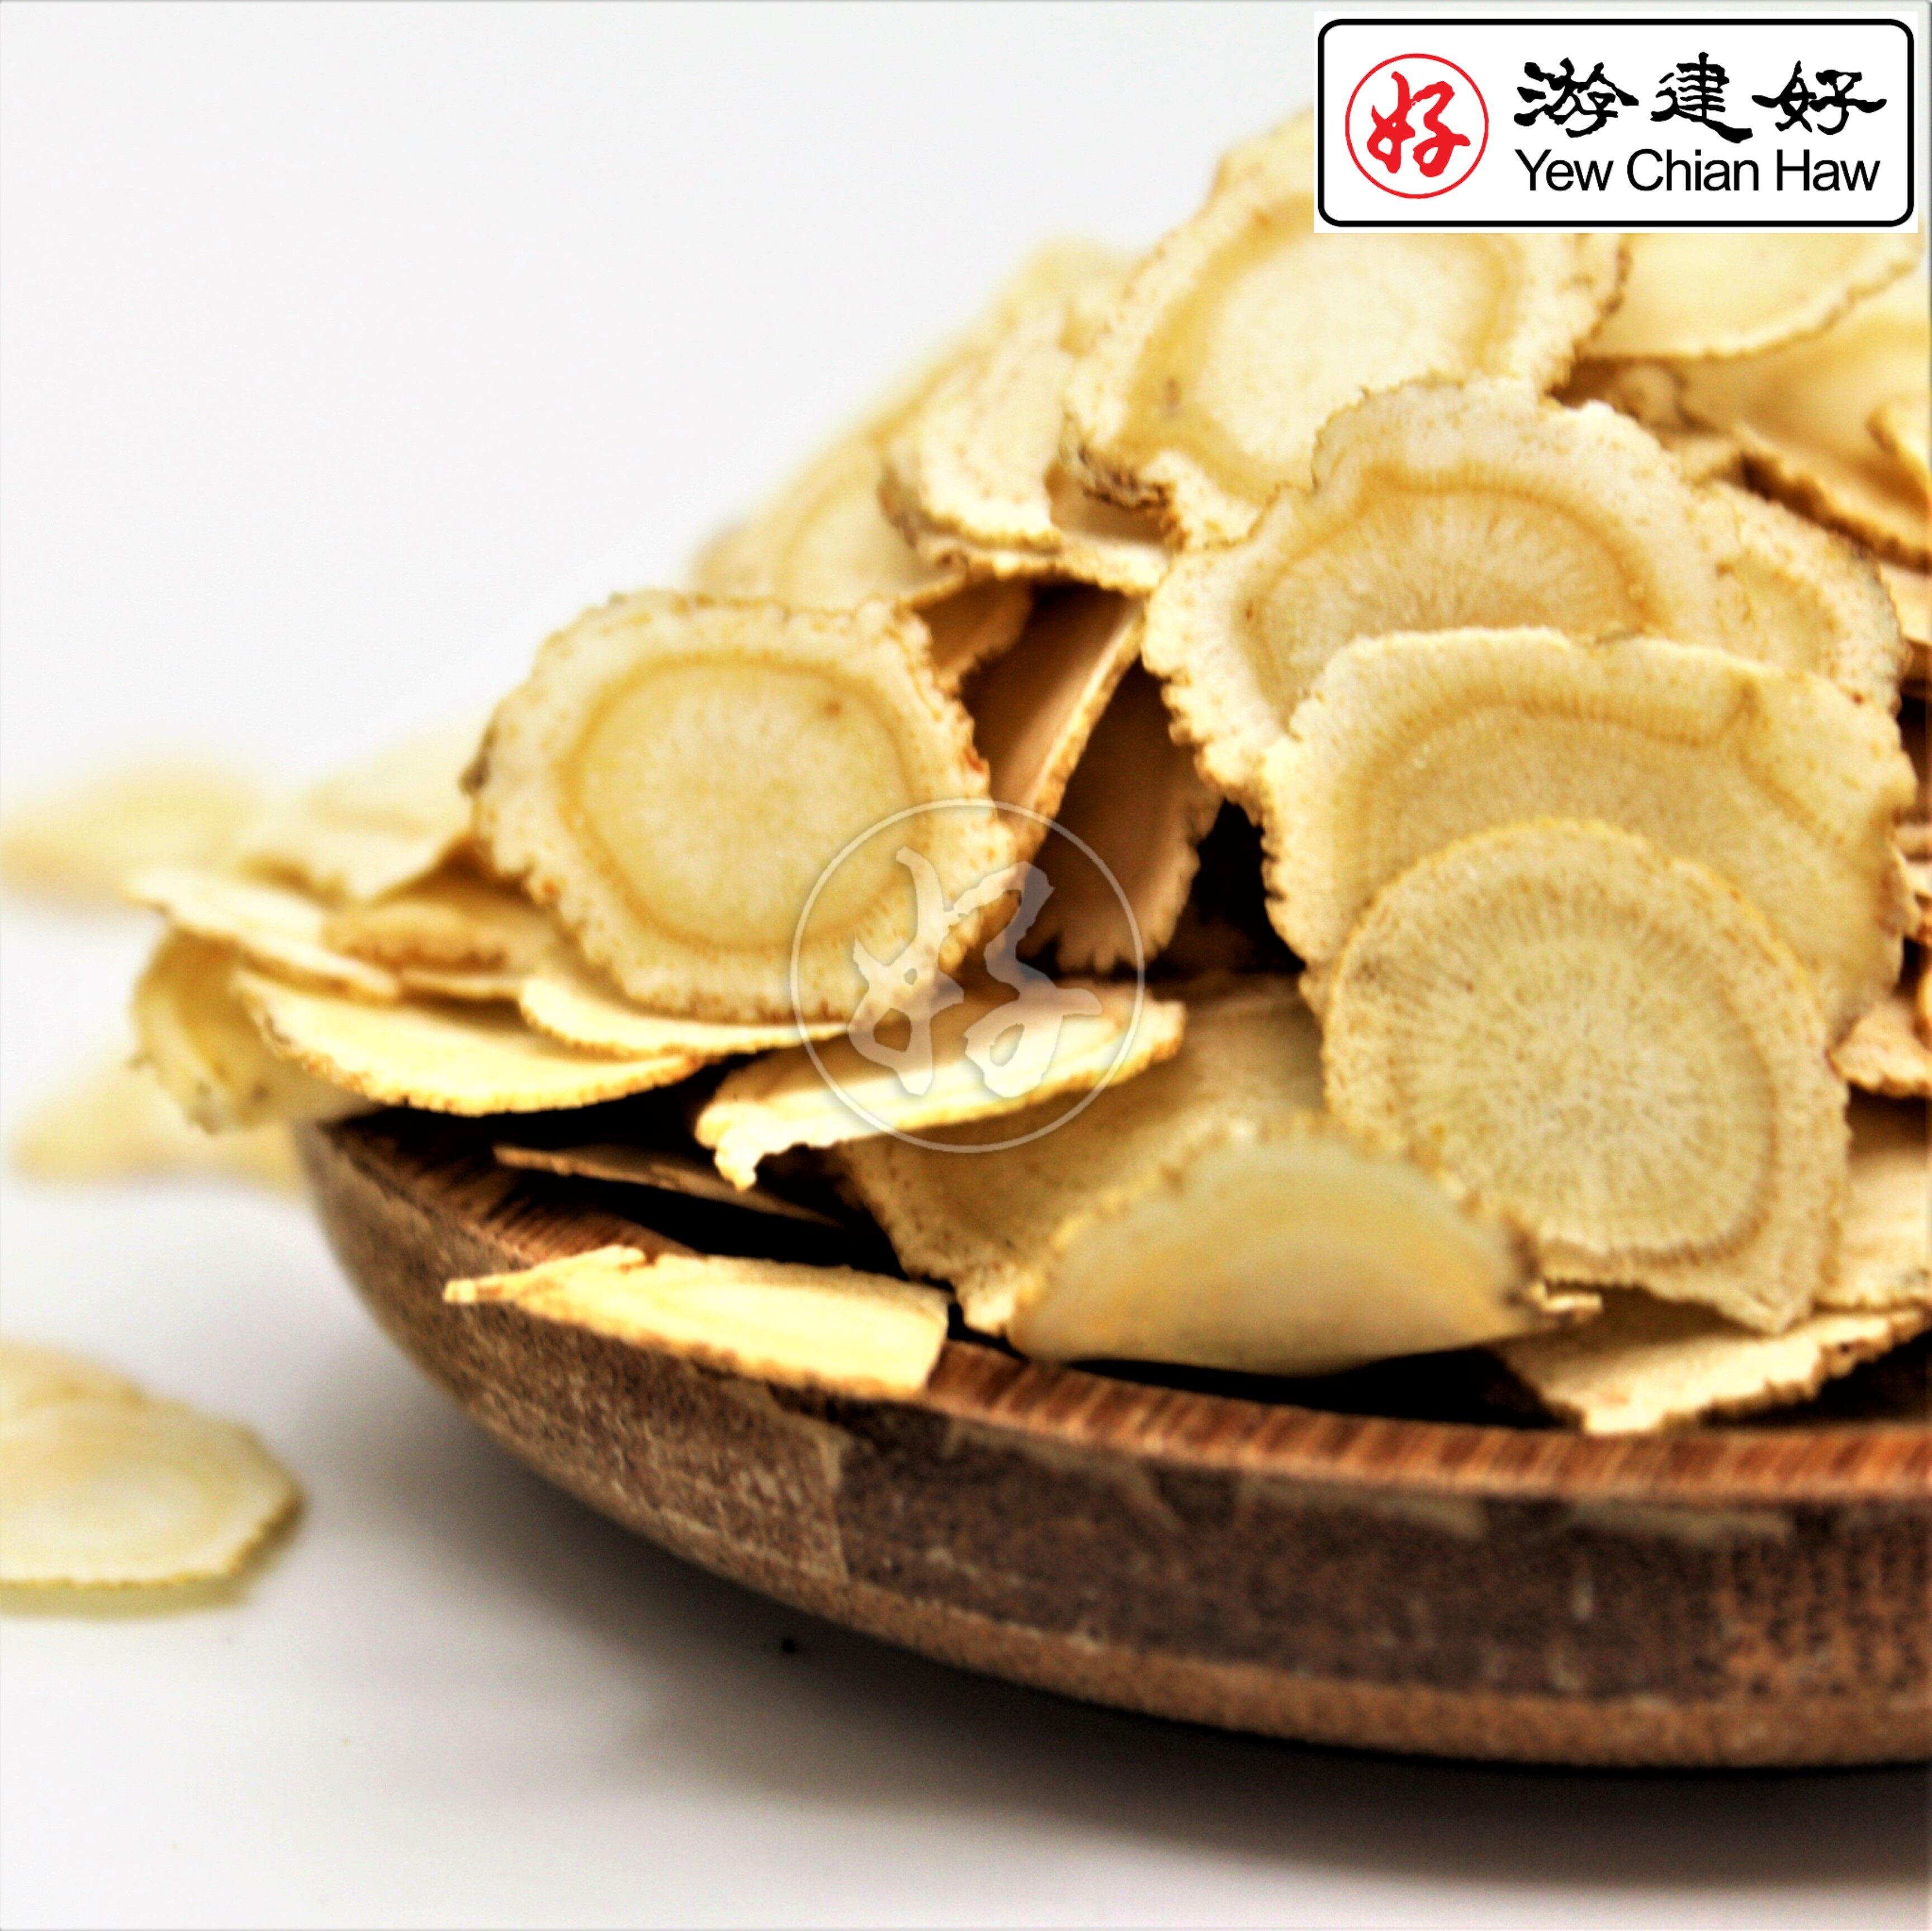 YCH Herbs 泡参片 Ginseng Pao Shen 4g (2 years shelf life) herbs pack